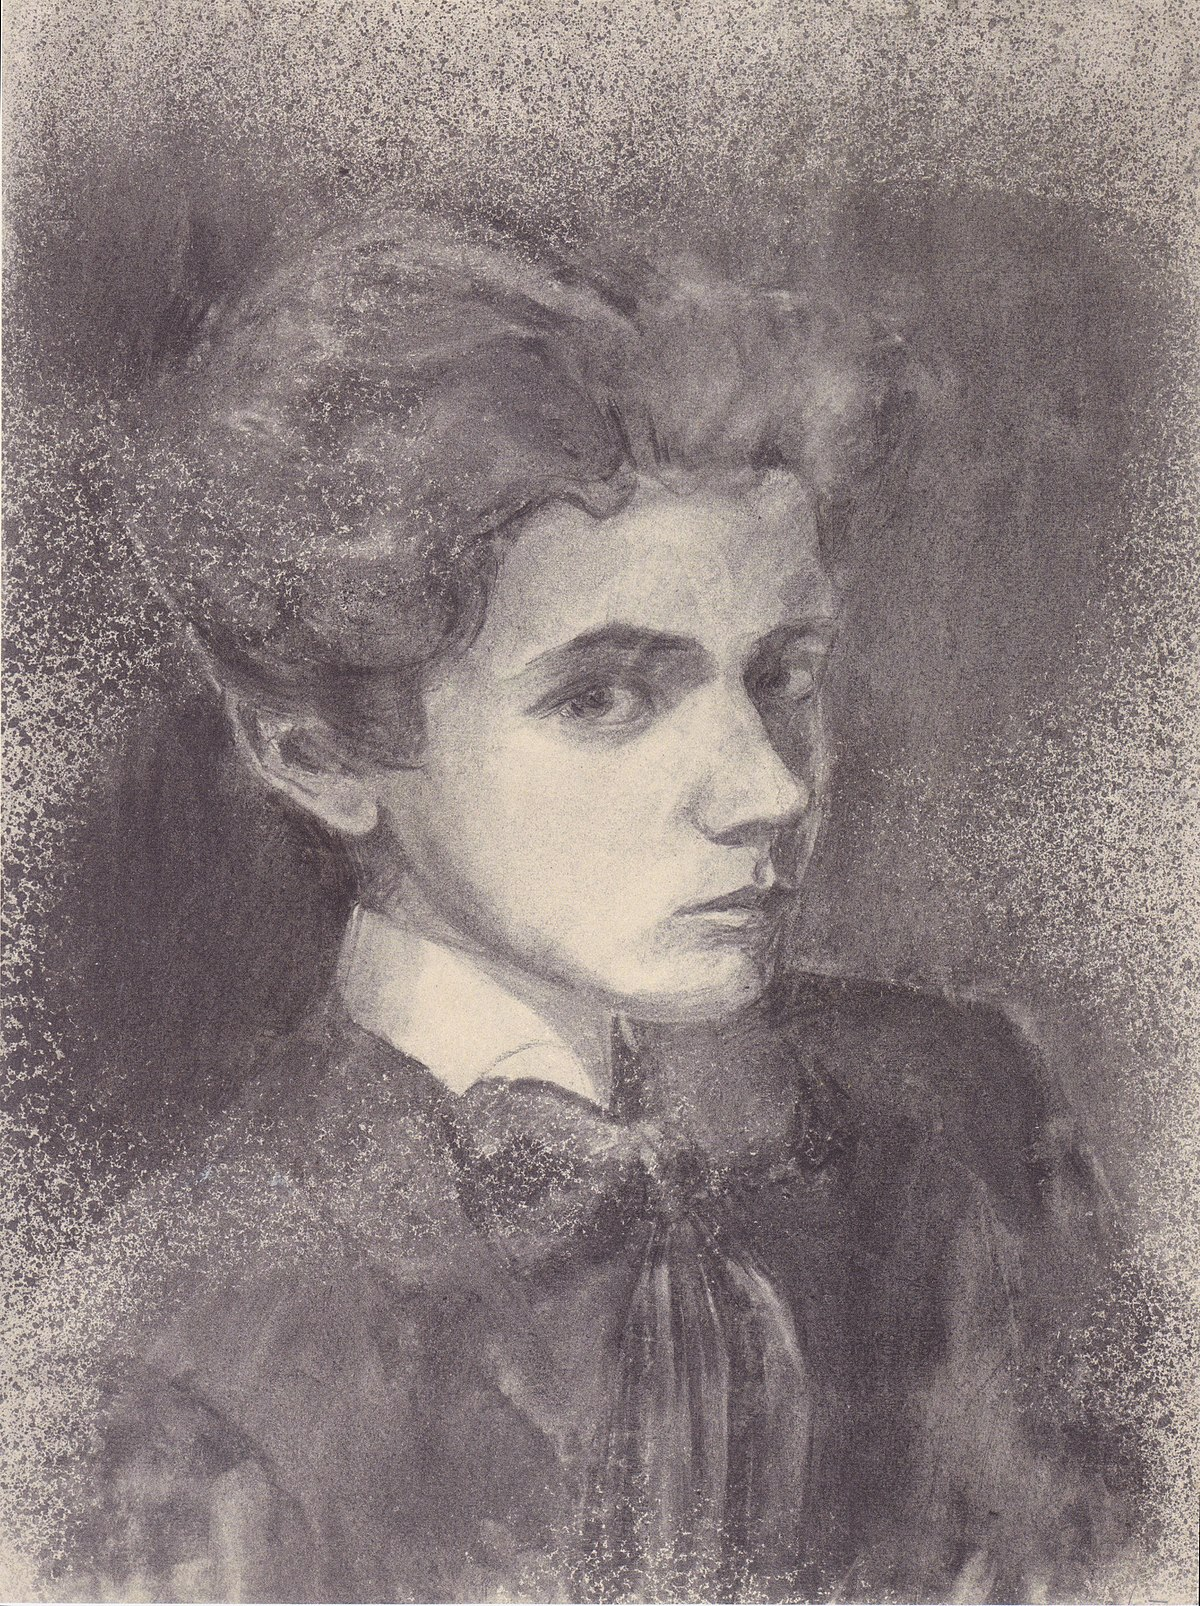 Selfportraits By Egon Schiele Wikimedia Commons